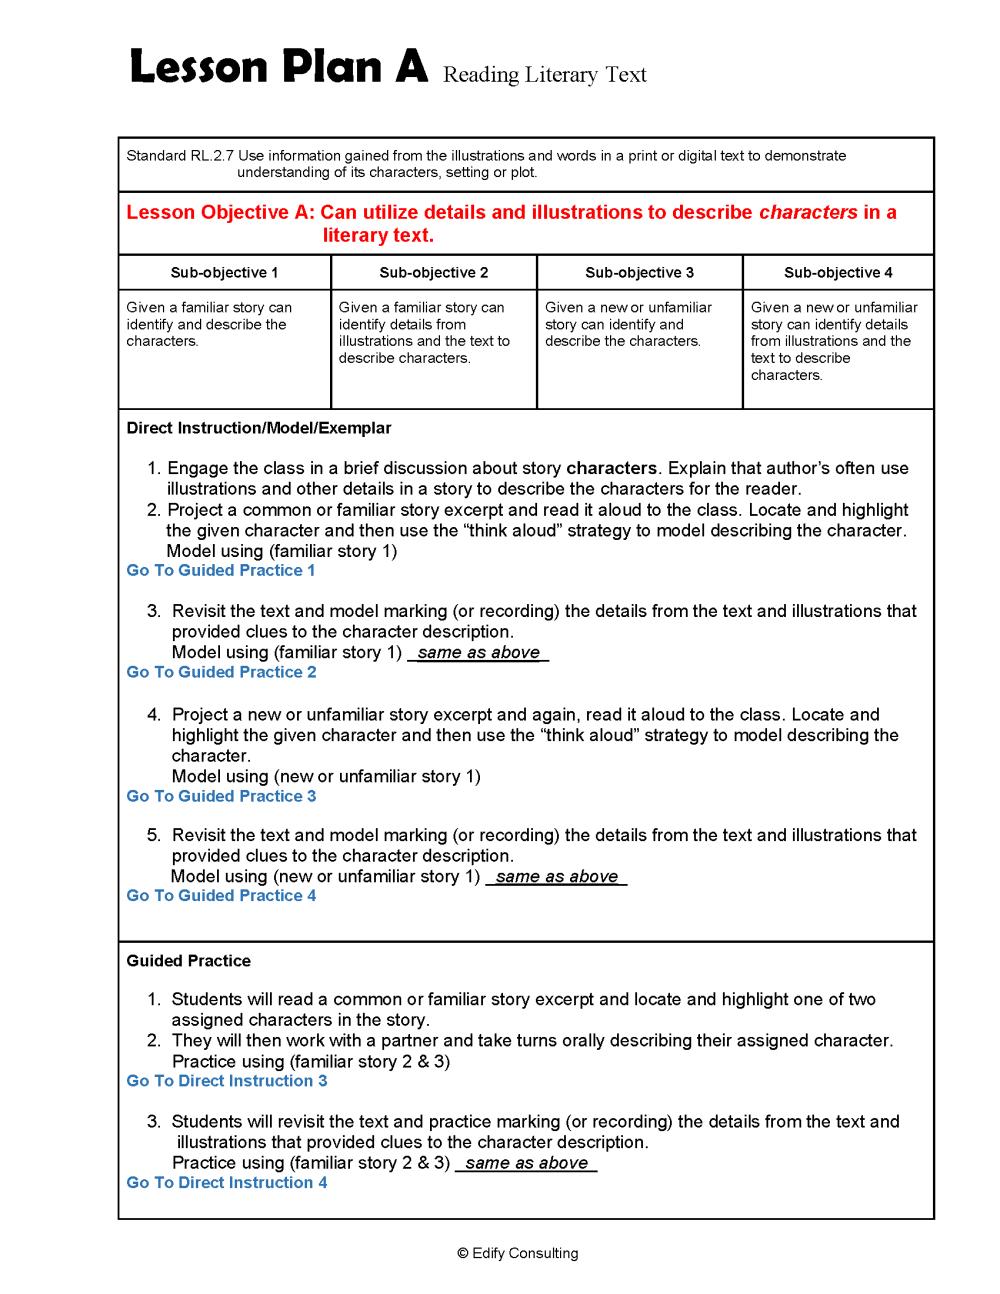 medium resolution of Alabama Lesson Plans RL.2.7 – ELA 2nd Grade (4 Lesson Plans) –  ShopDollar.com: Online Shopping for Teachers Saving on Classroom Supplies